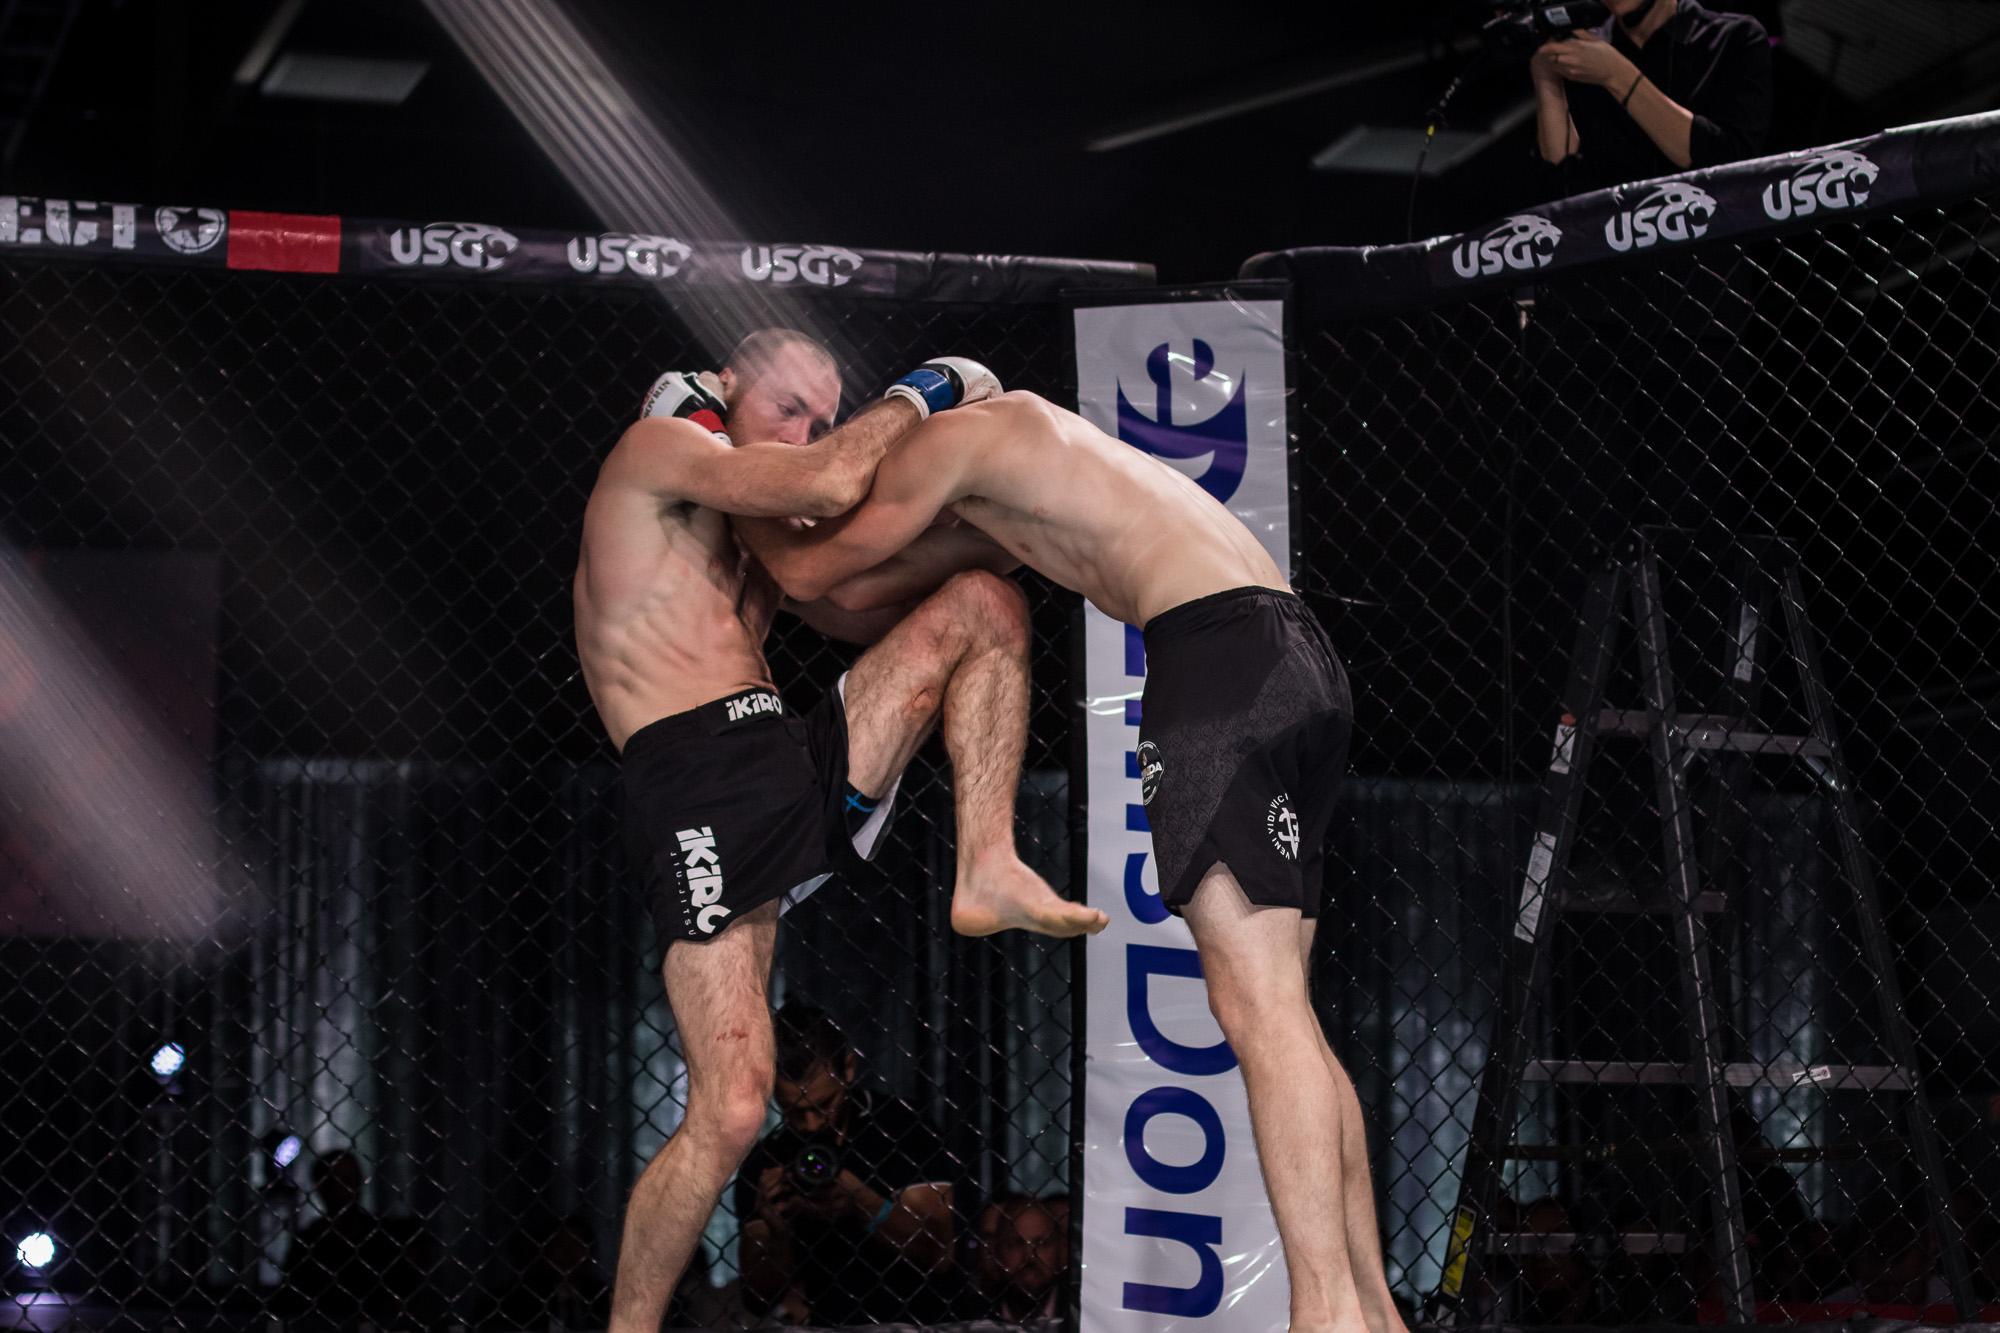 Fight #3 - Seth Connor vs. Ryan O'Shea